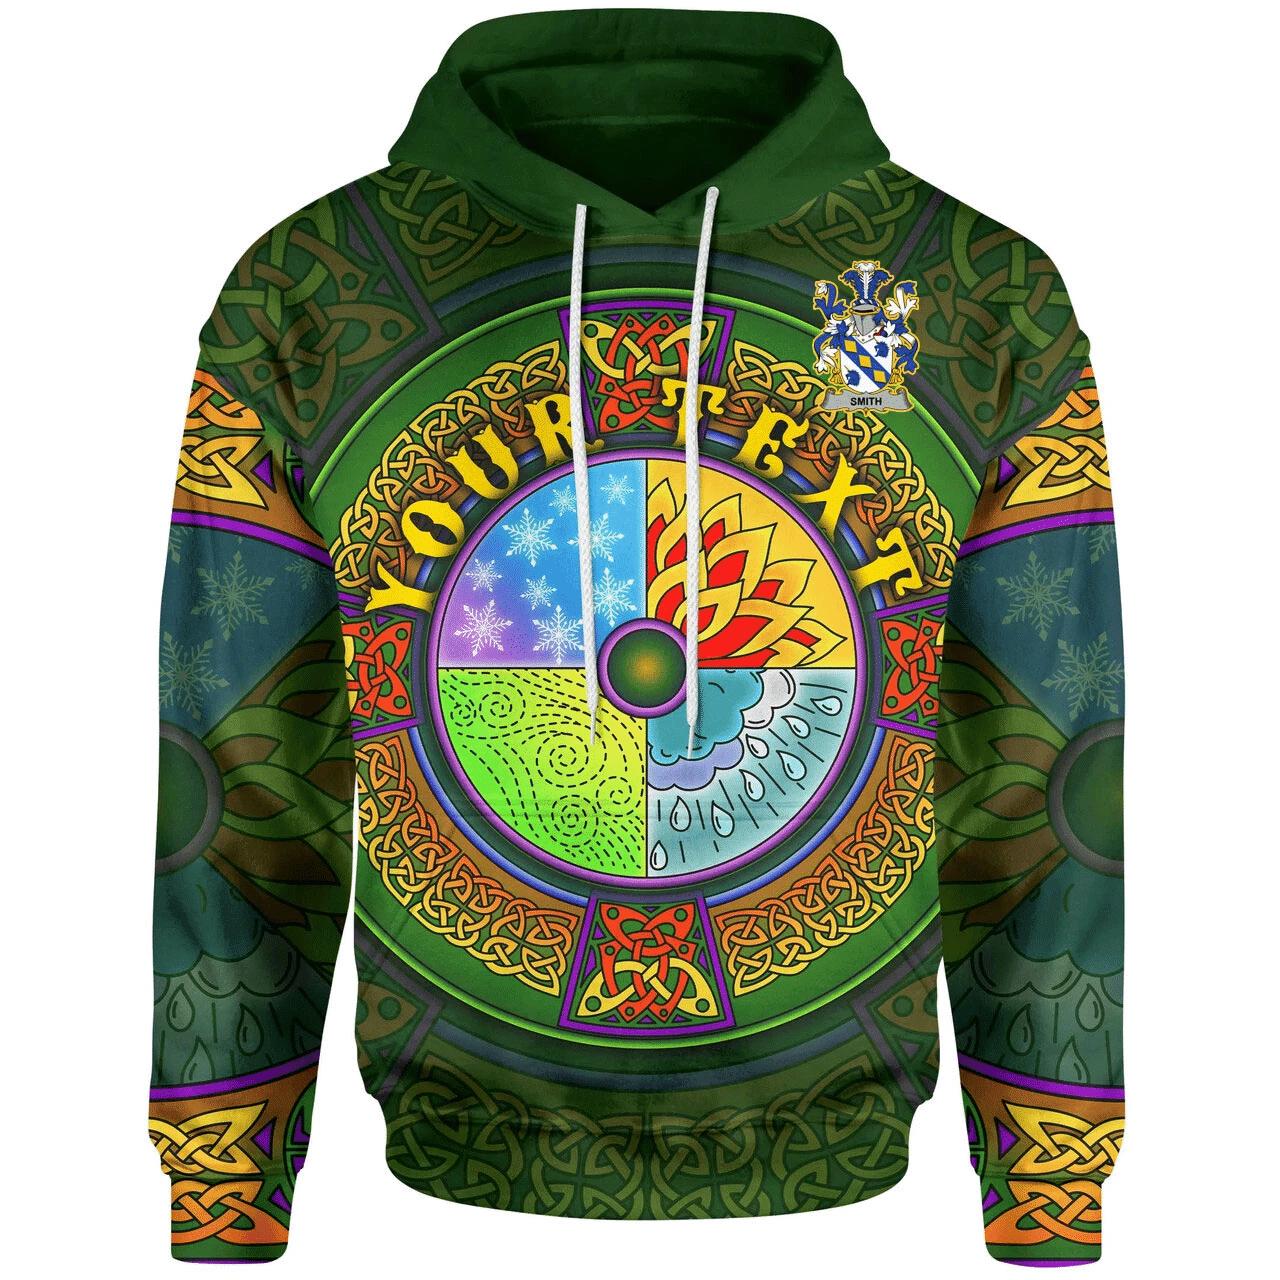 (Custom) 1stIreland Ireland Hoodie - Smith or Smyth Irish Family Crest Hoodie - Celtic Element A7